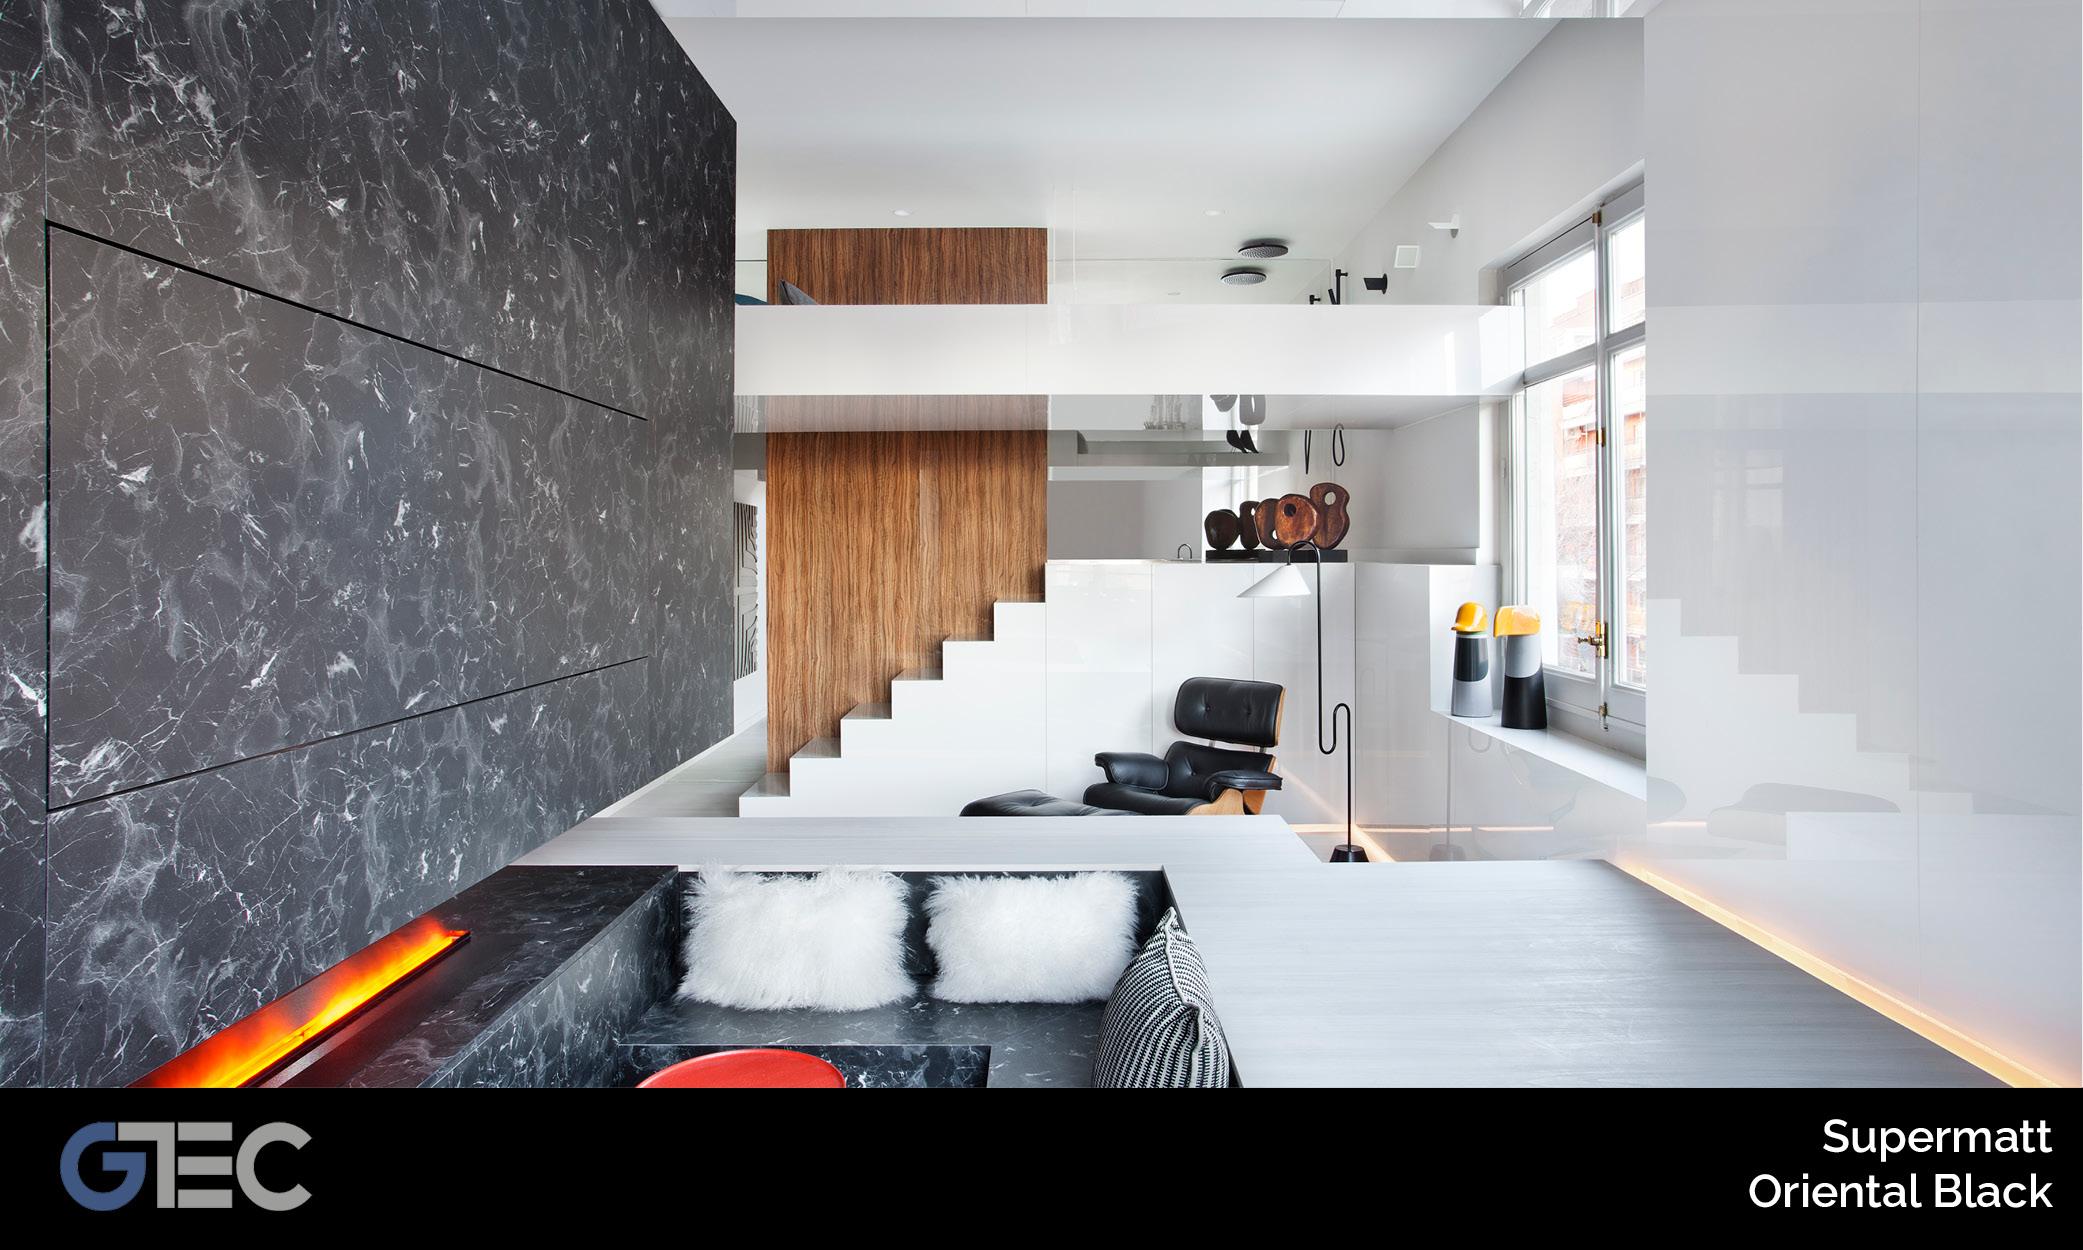 supermatt oriental black panel